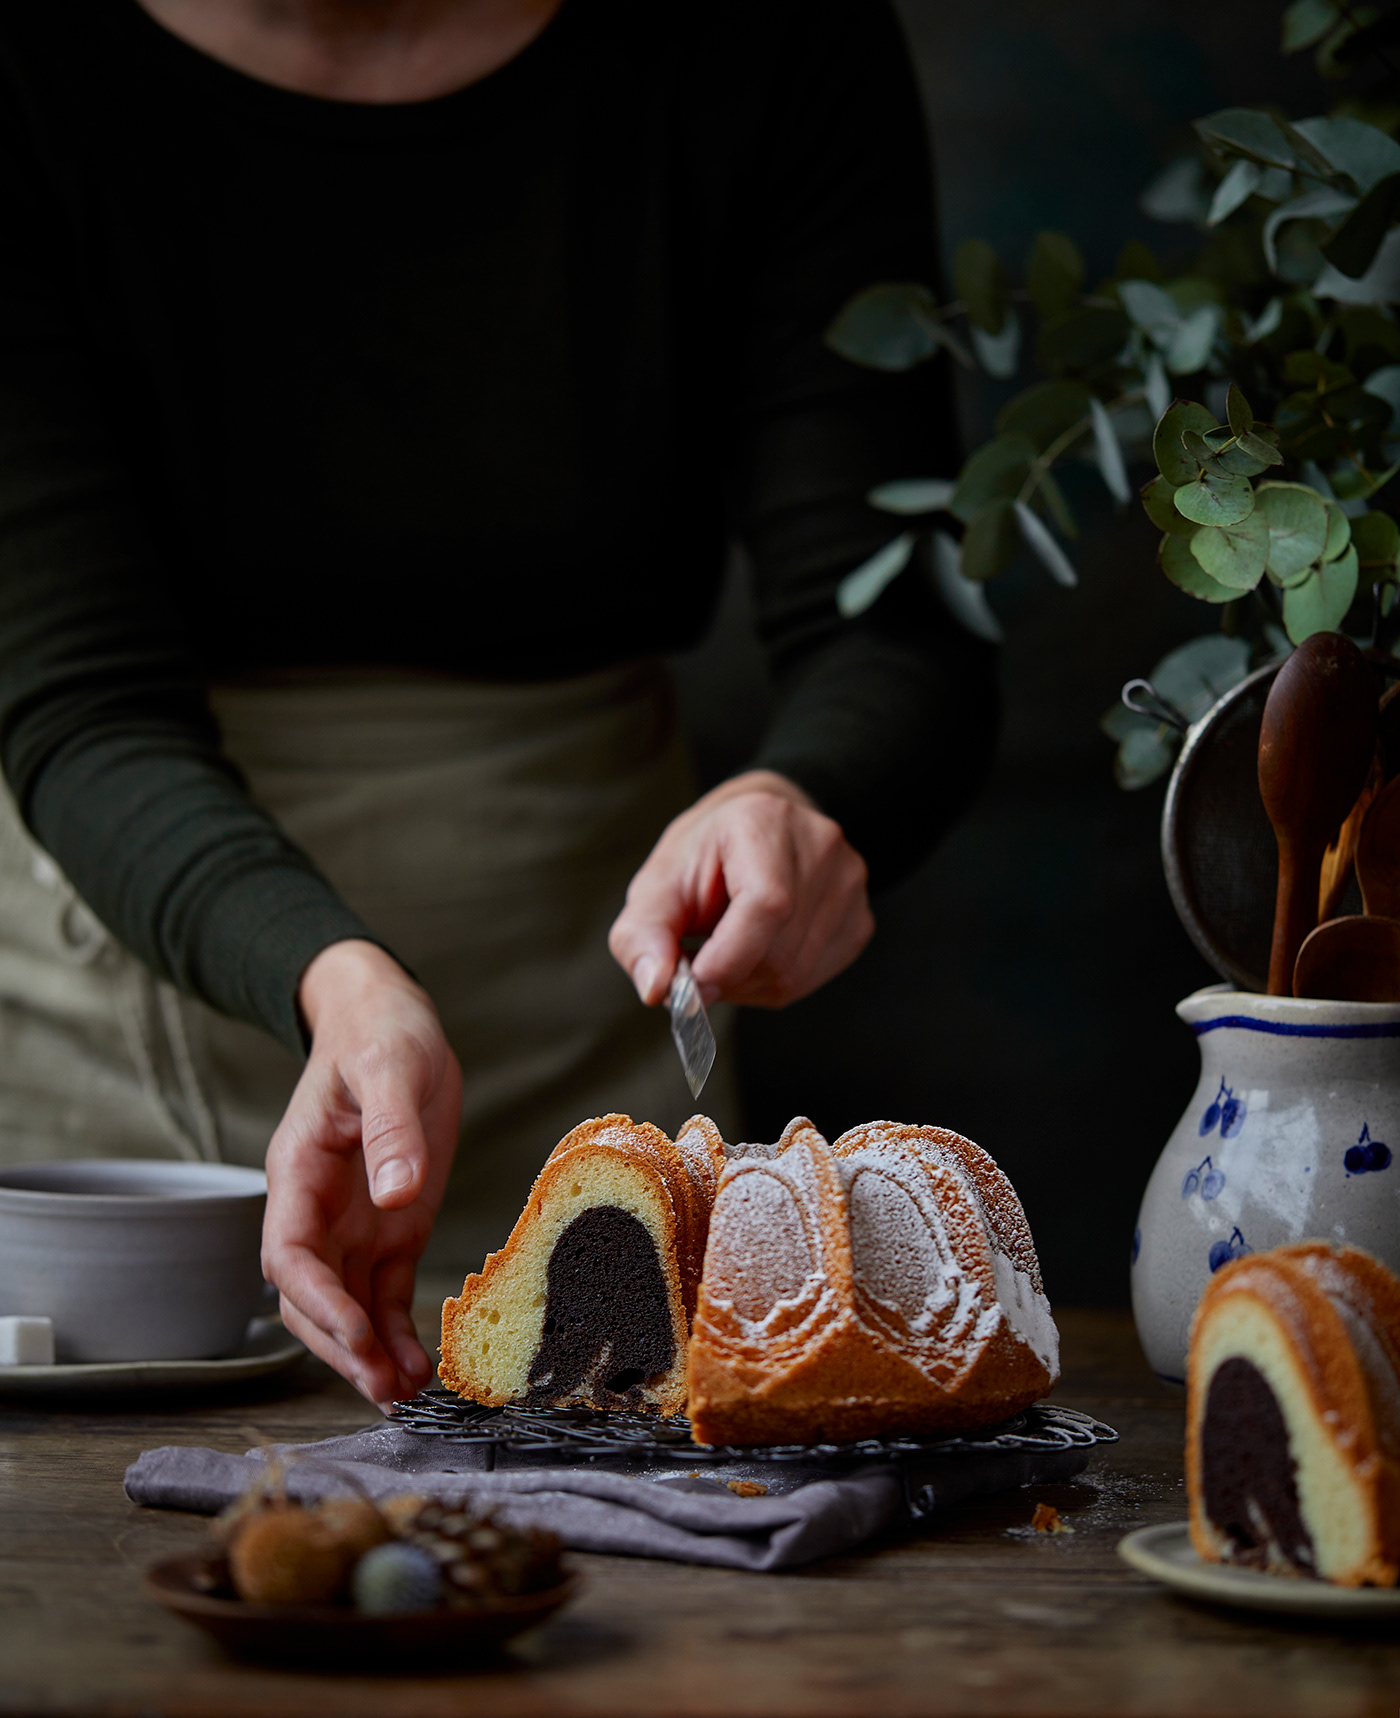 bakery Bundt Cake cake dessert food photographer food photography food styling food stylist pastry sweet